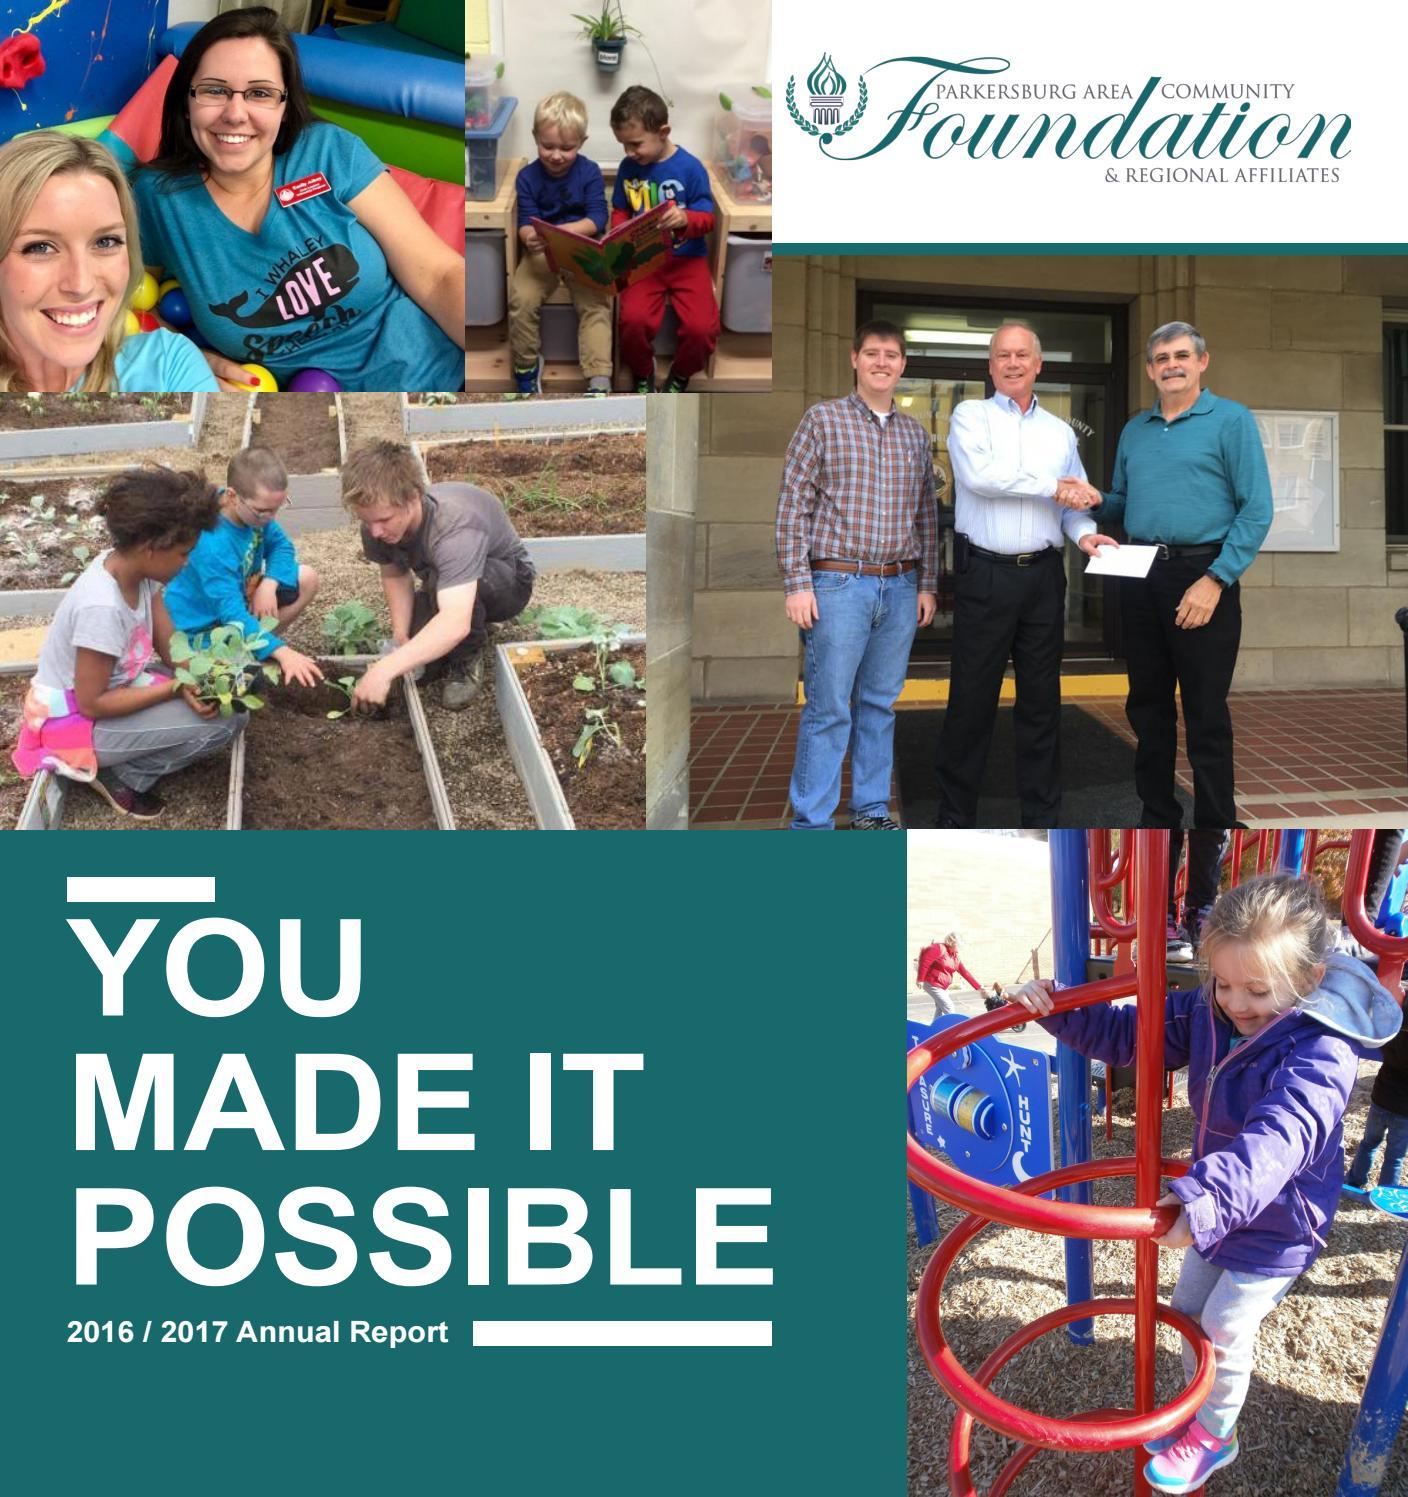 PACF Annual Report 2017 By Parkersburg Area Community Foundation U0026 Regional  Affiliates (PACF)   Issuu